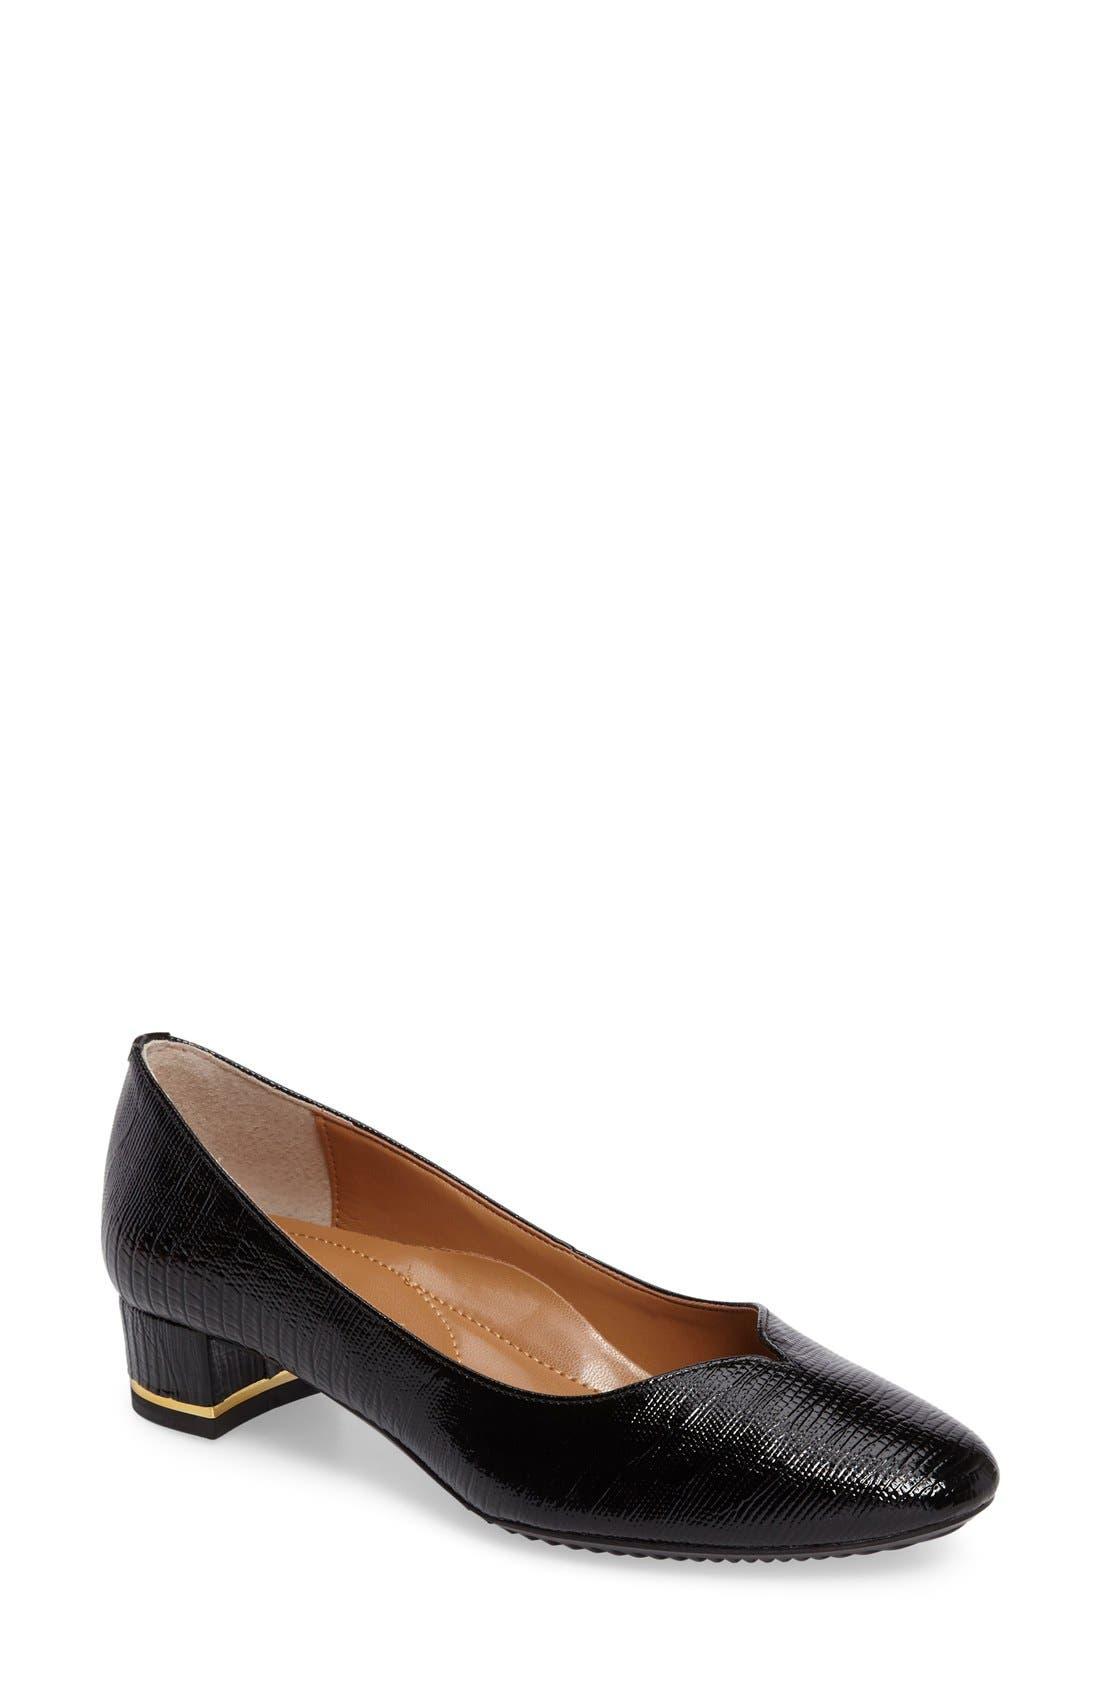 Bambalina Block Heel Pump,                         Main,                         color, BLACK FAUX LEATHER